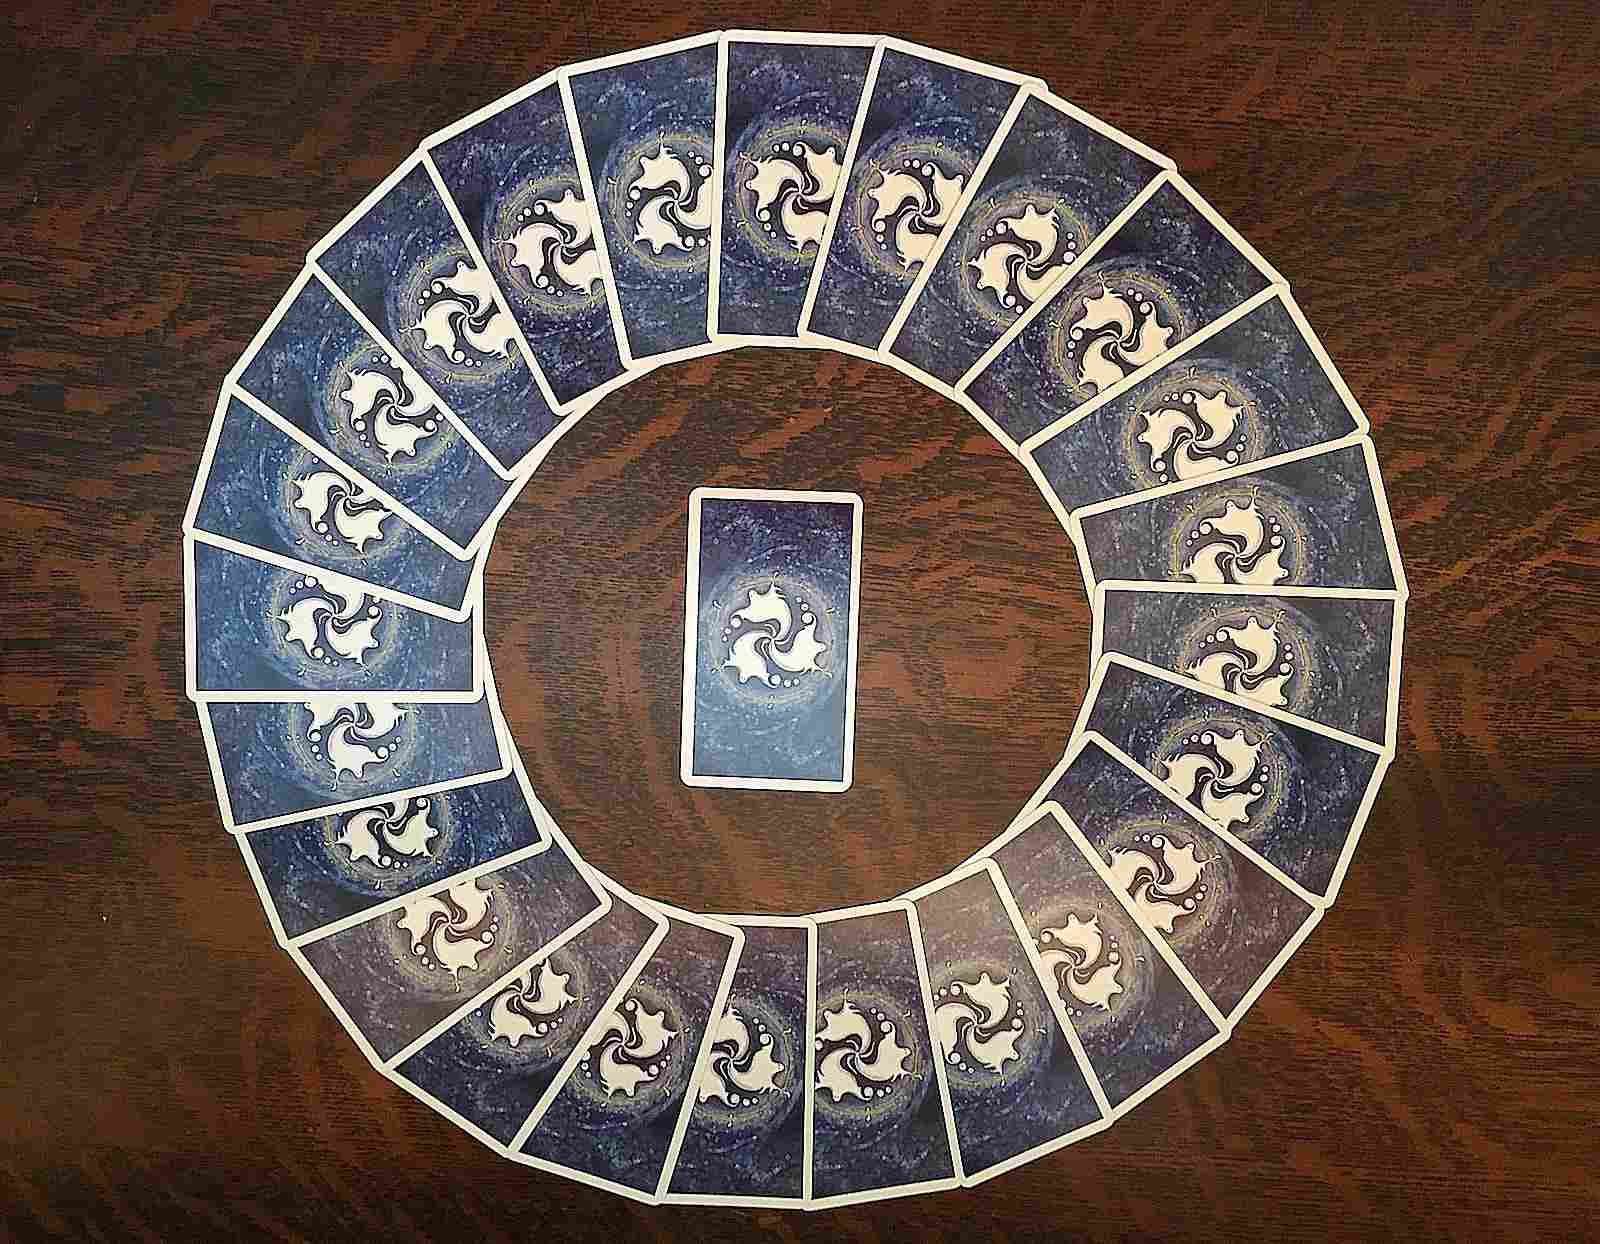 hunt-ghost-tarot-circle.jpg